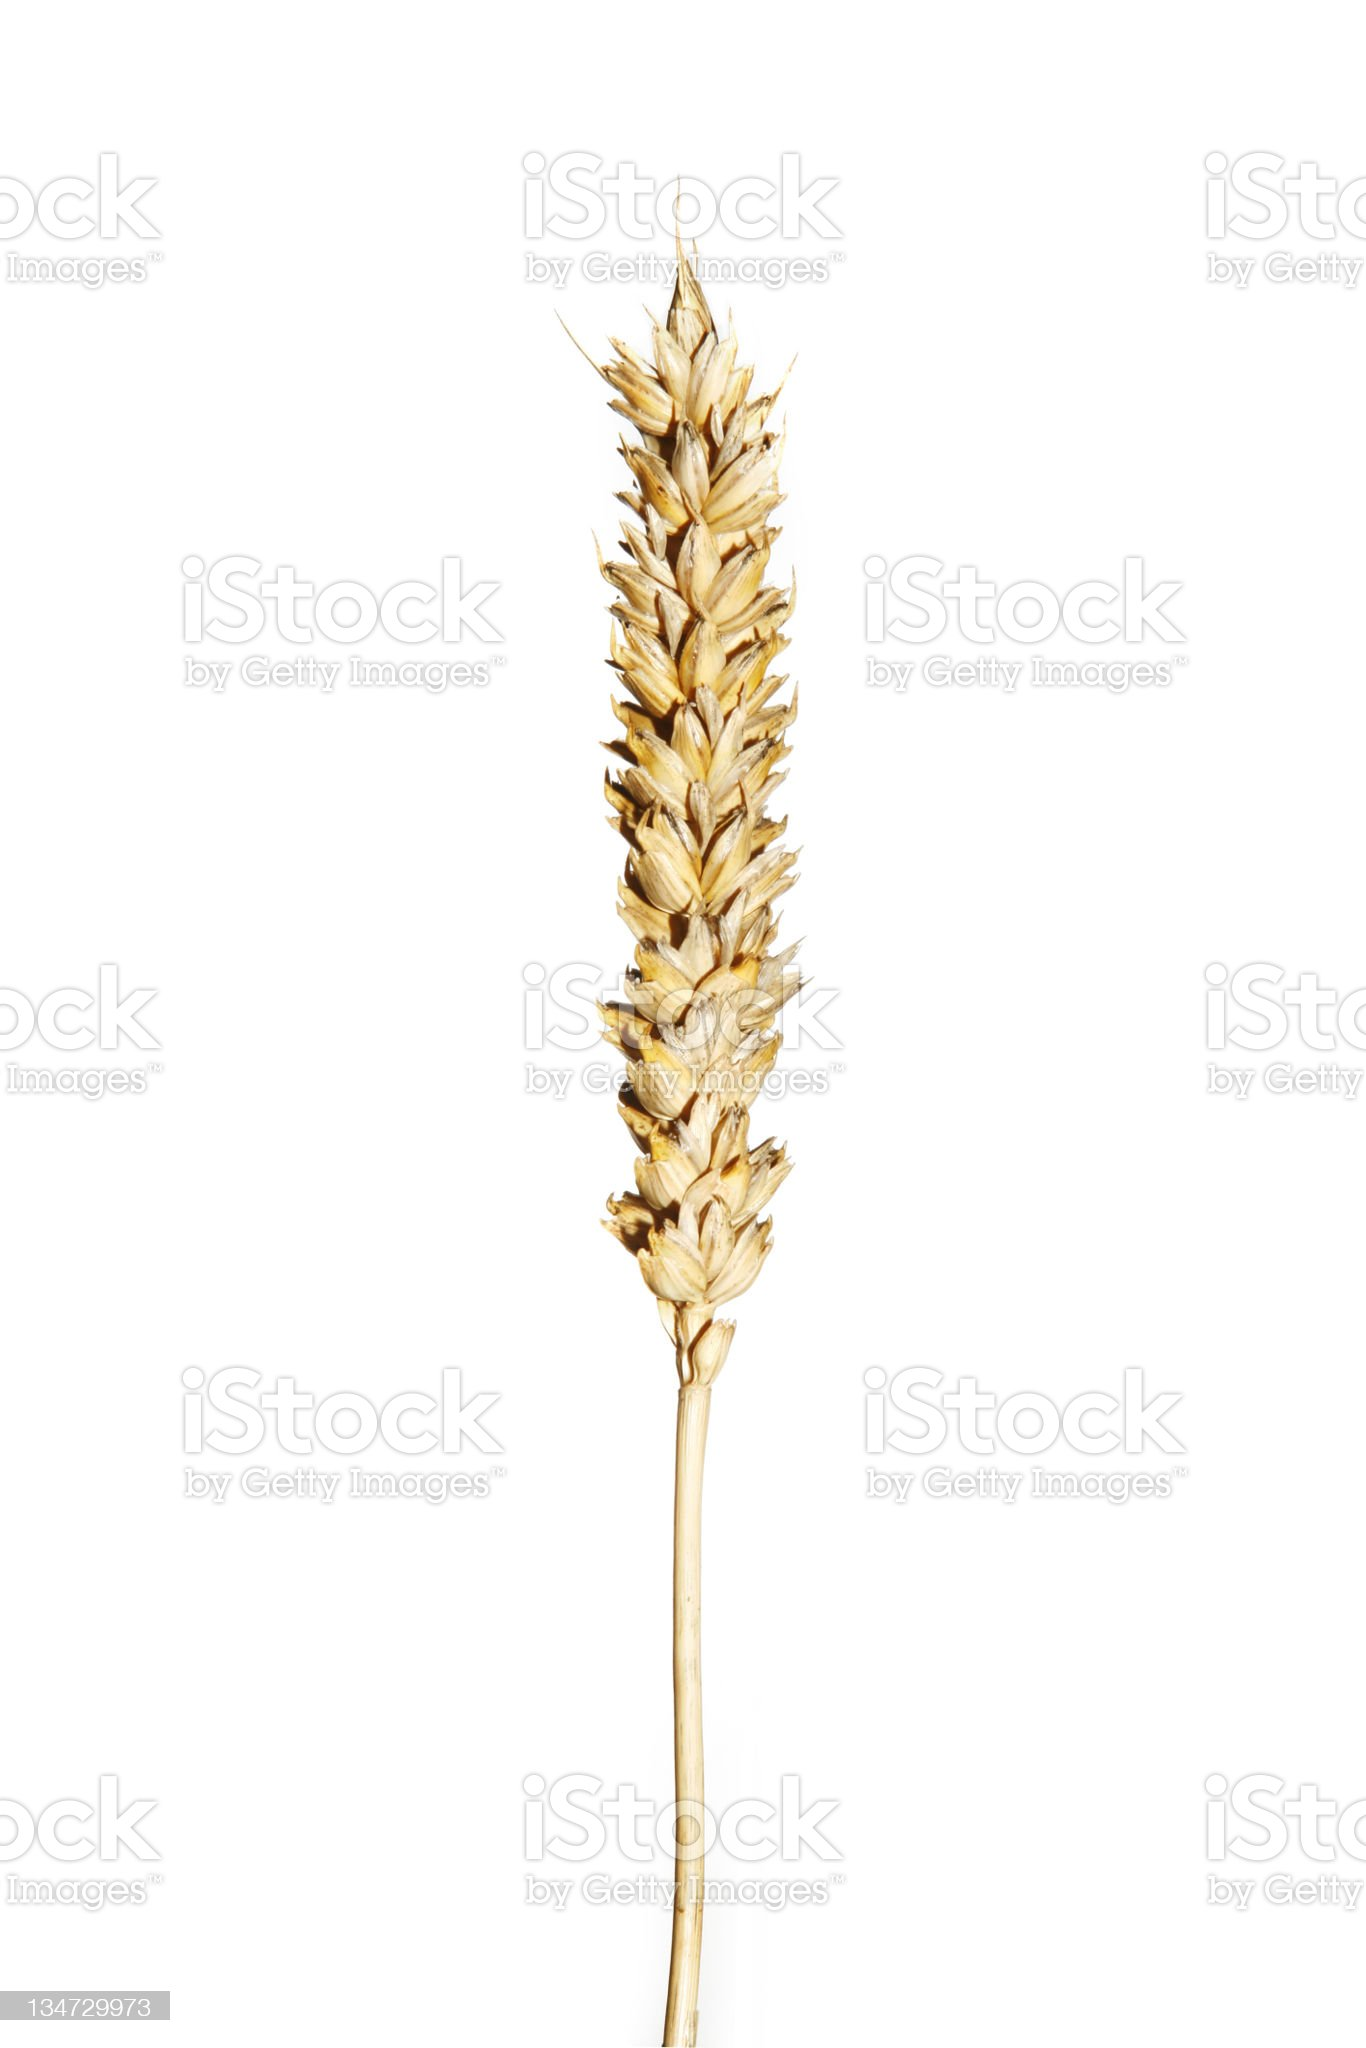 wheat alone royalty-free stock photo